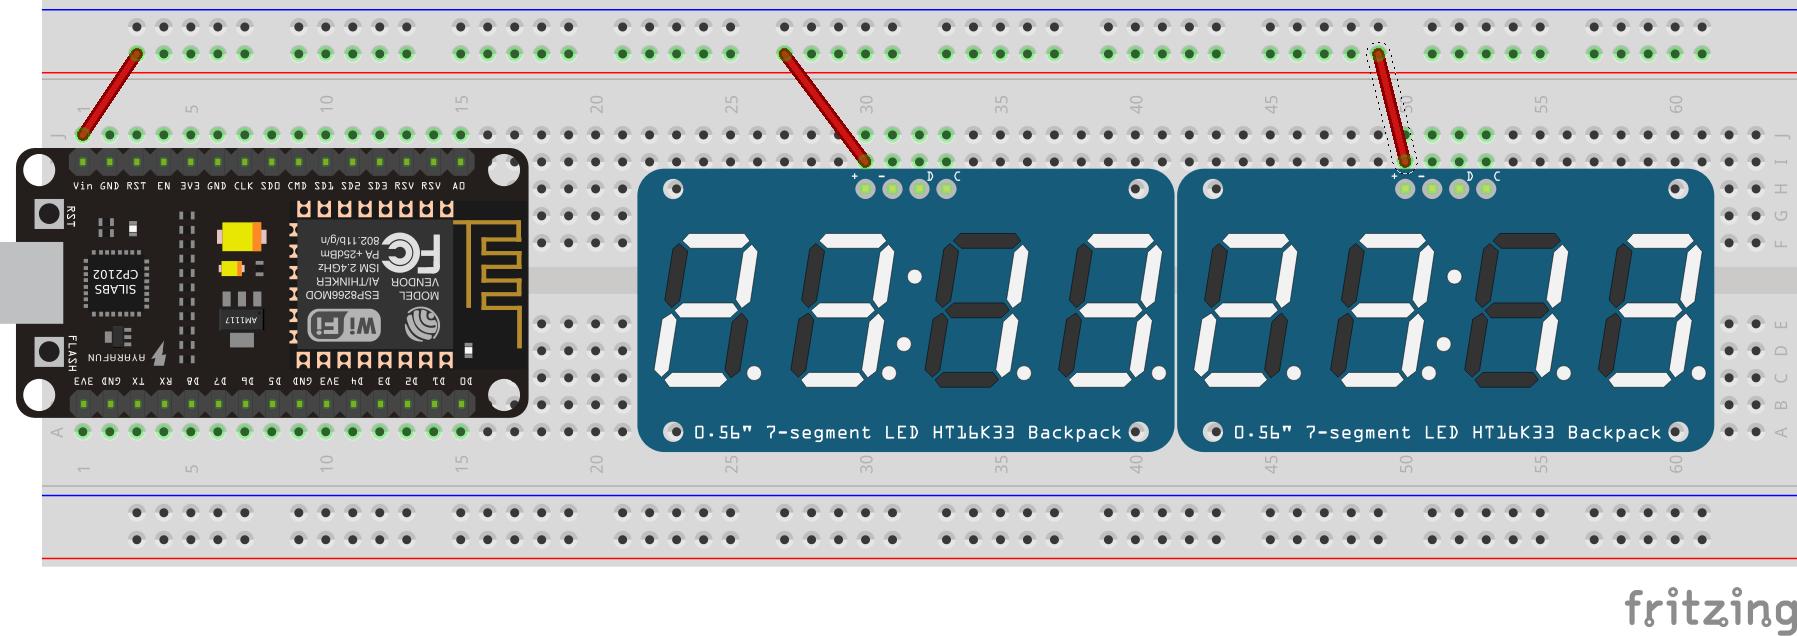 Voltage setup diagram